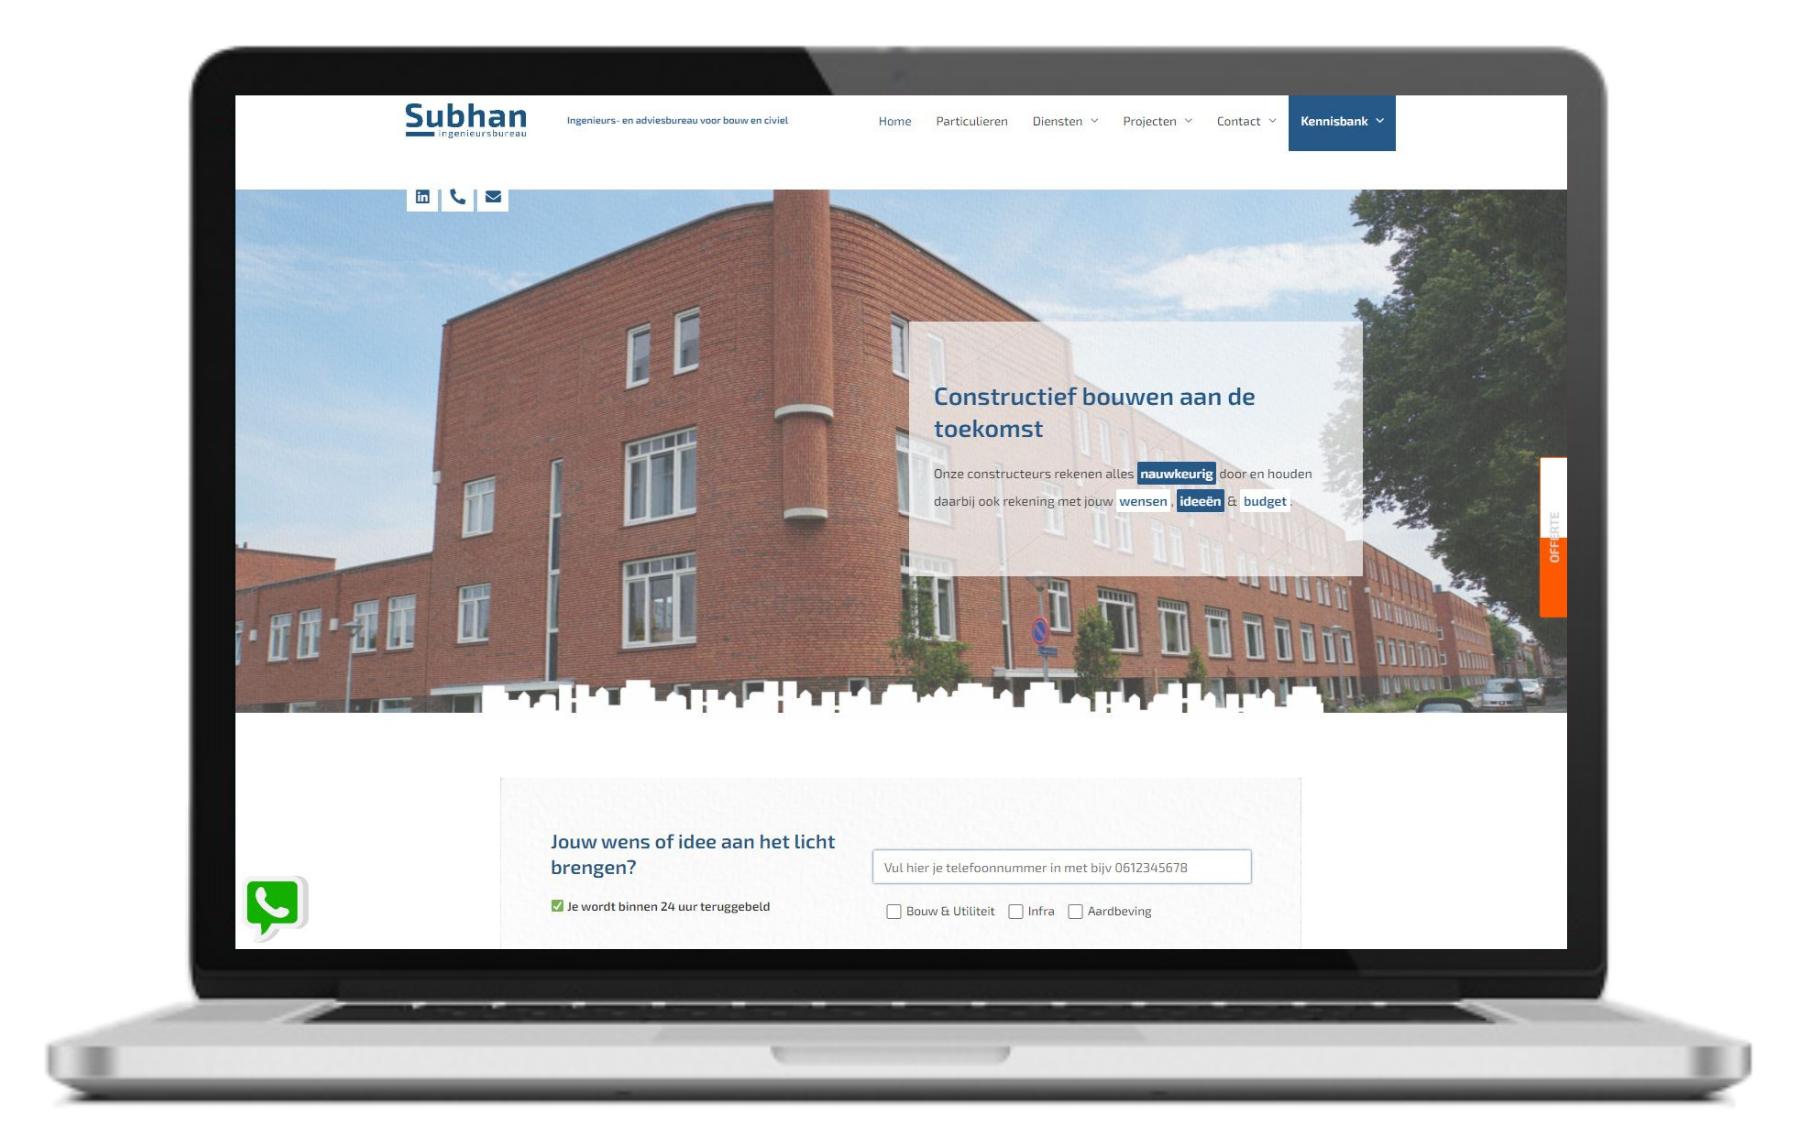 Subhan Ingenieursbureau website mock up